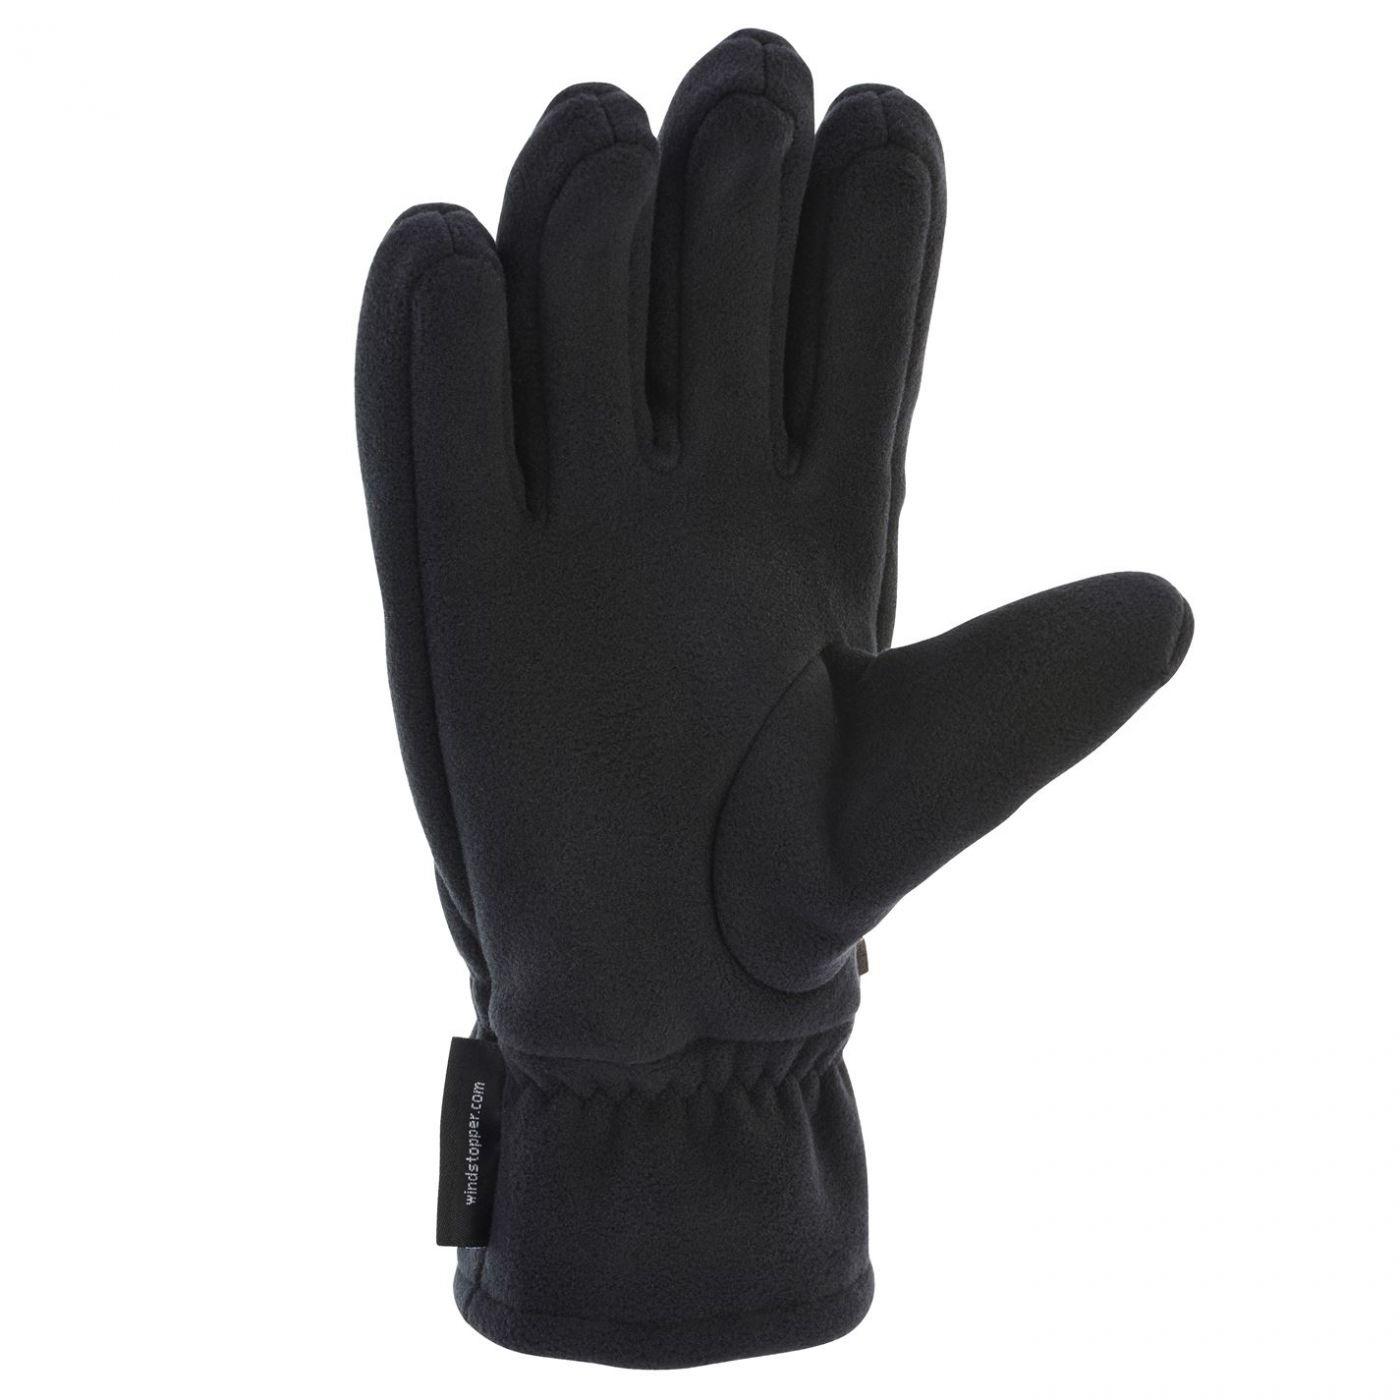 Extremities Wind Glove 91